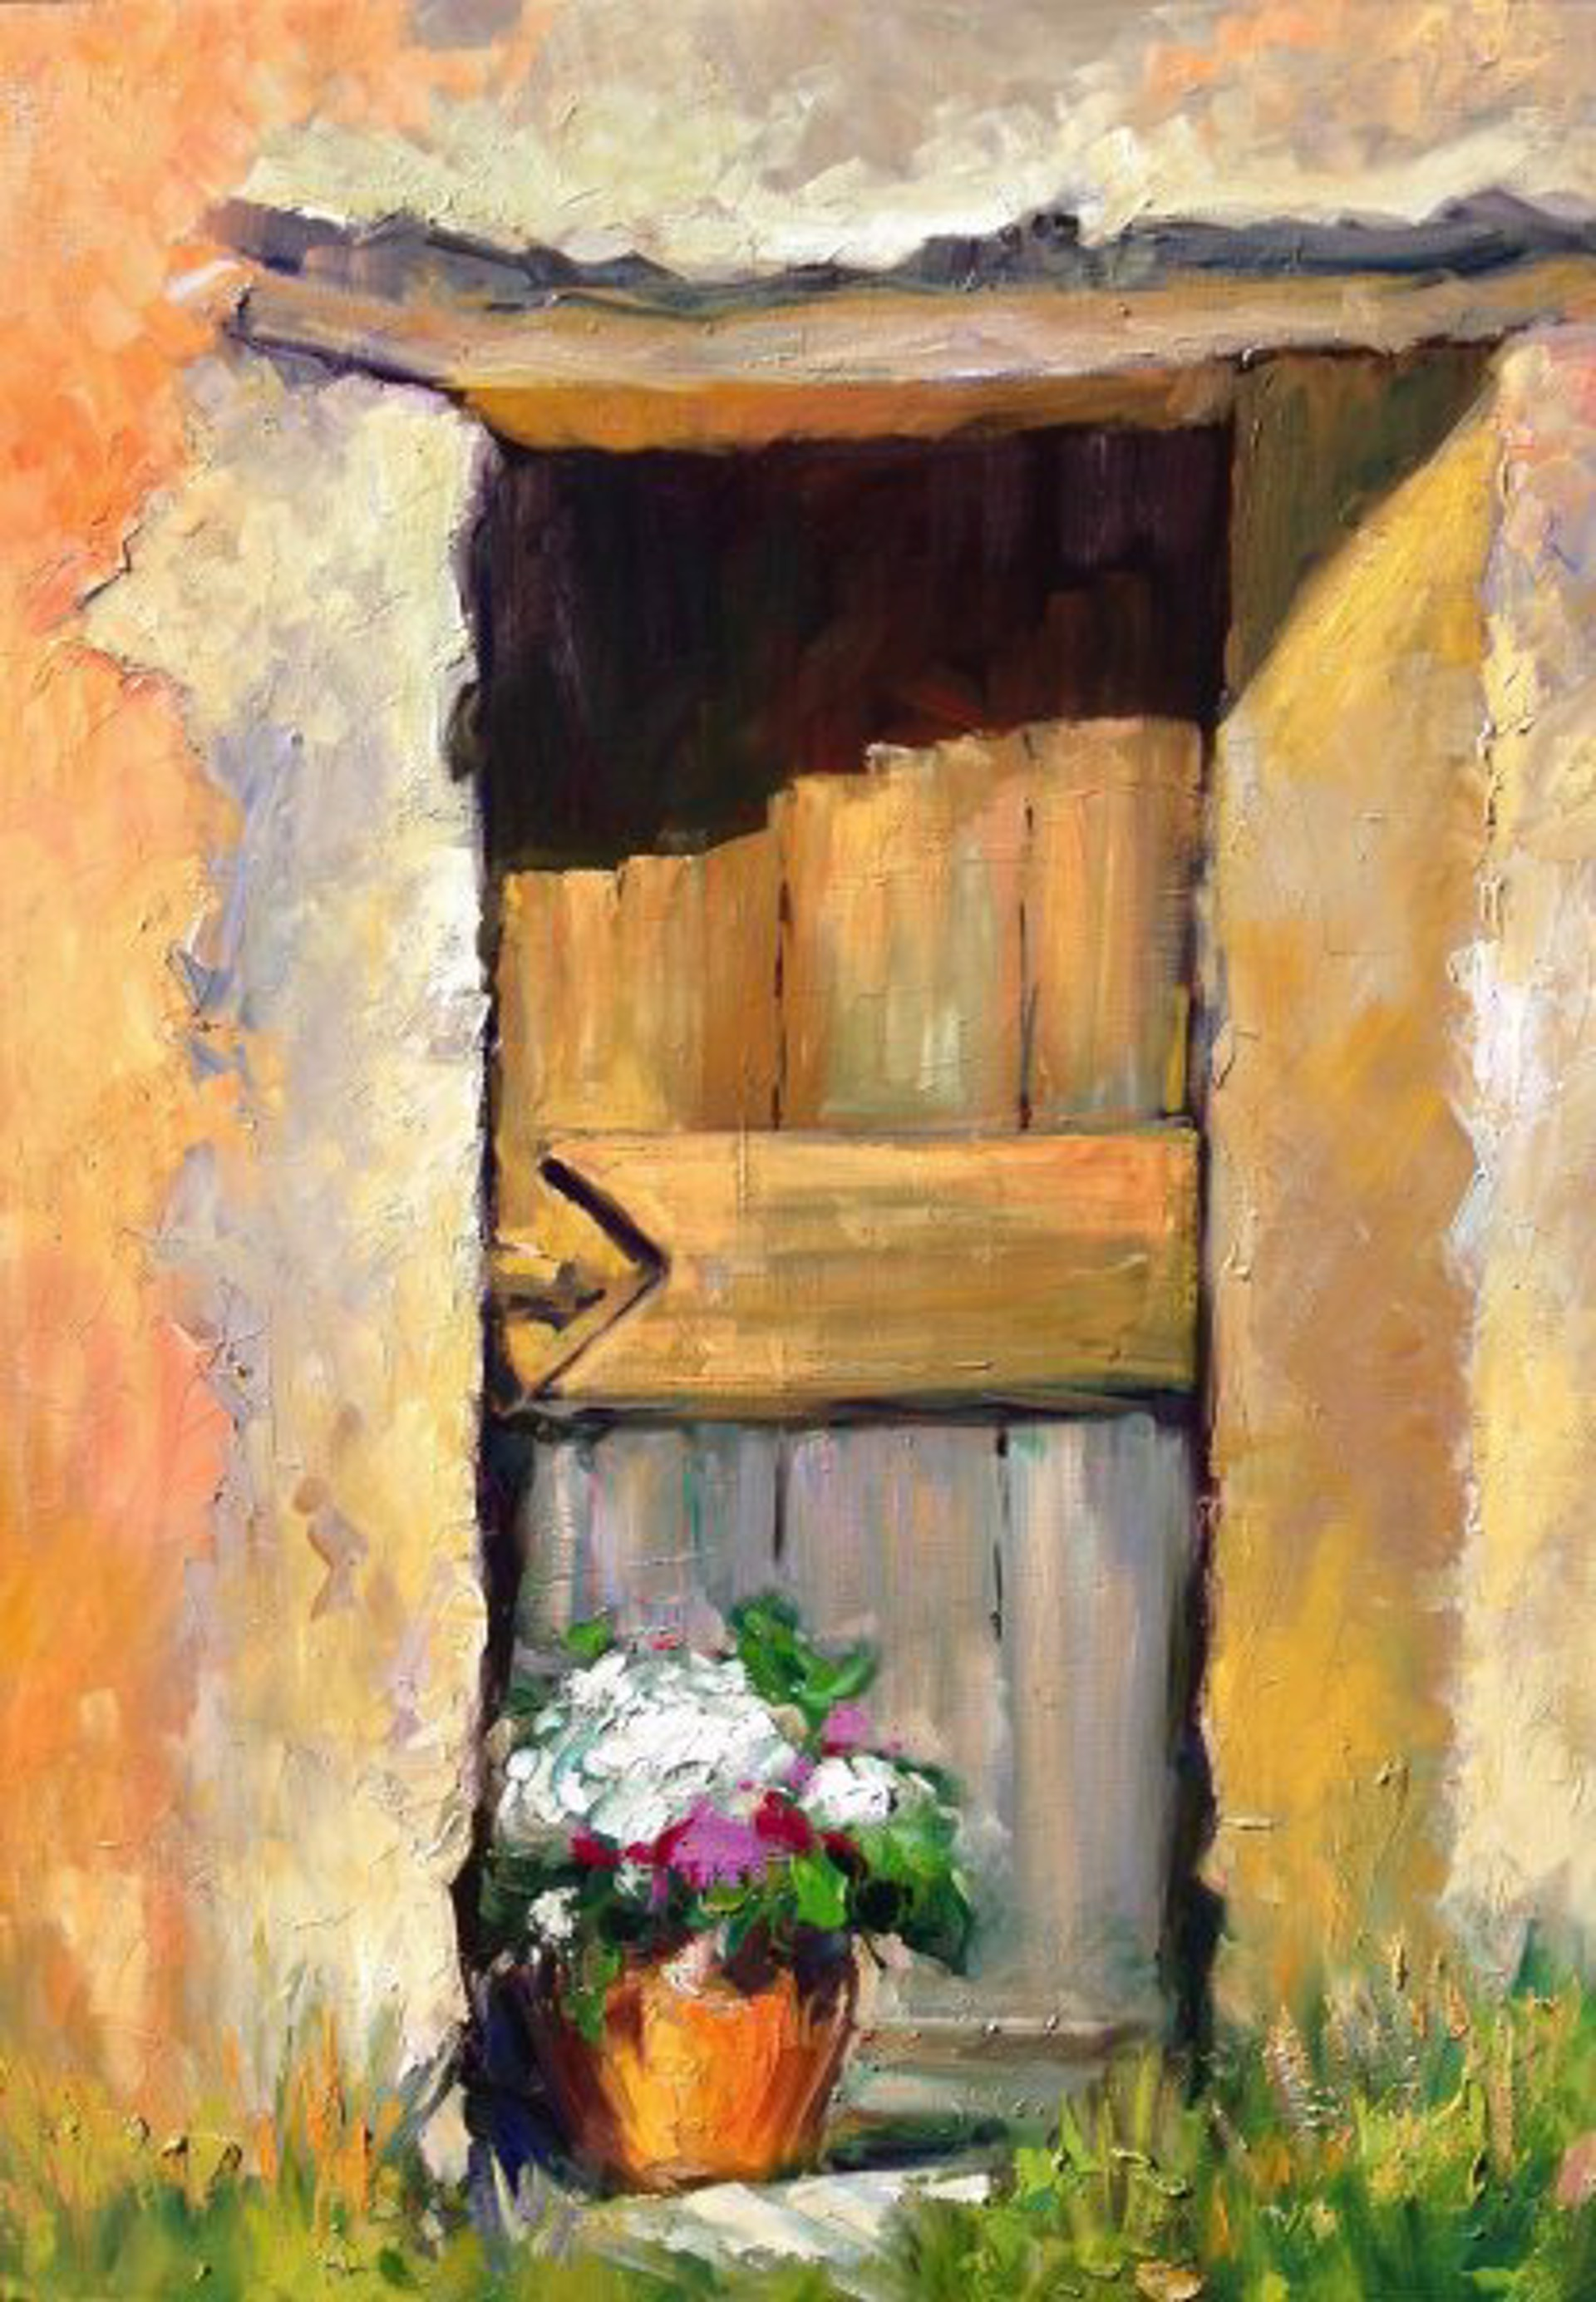 Wooden Door In The Textured Wall by Maria Bertrán